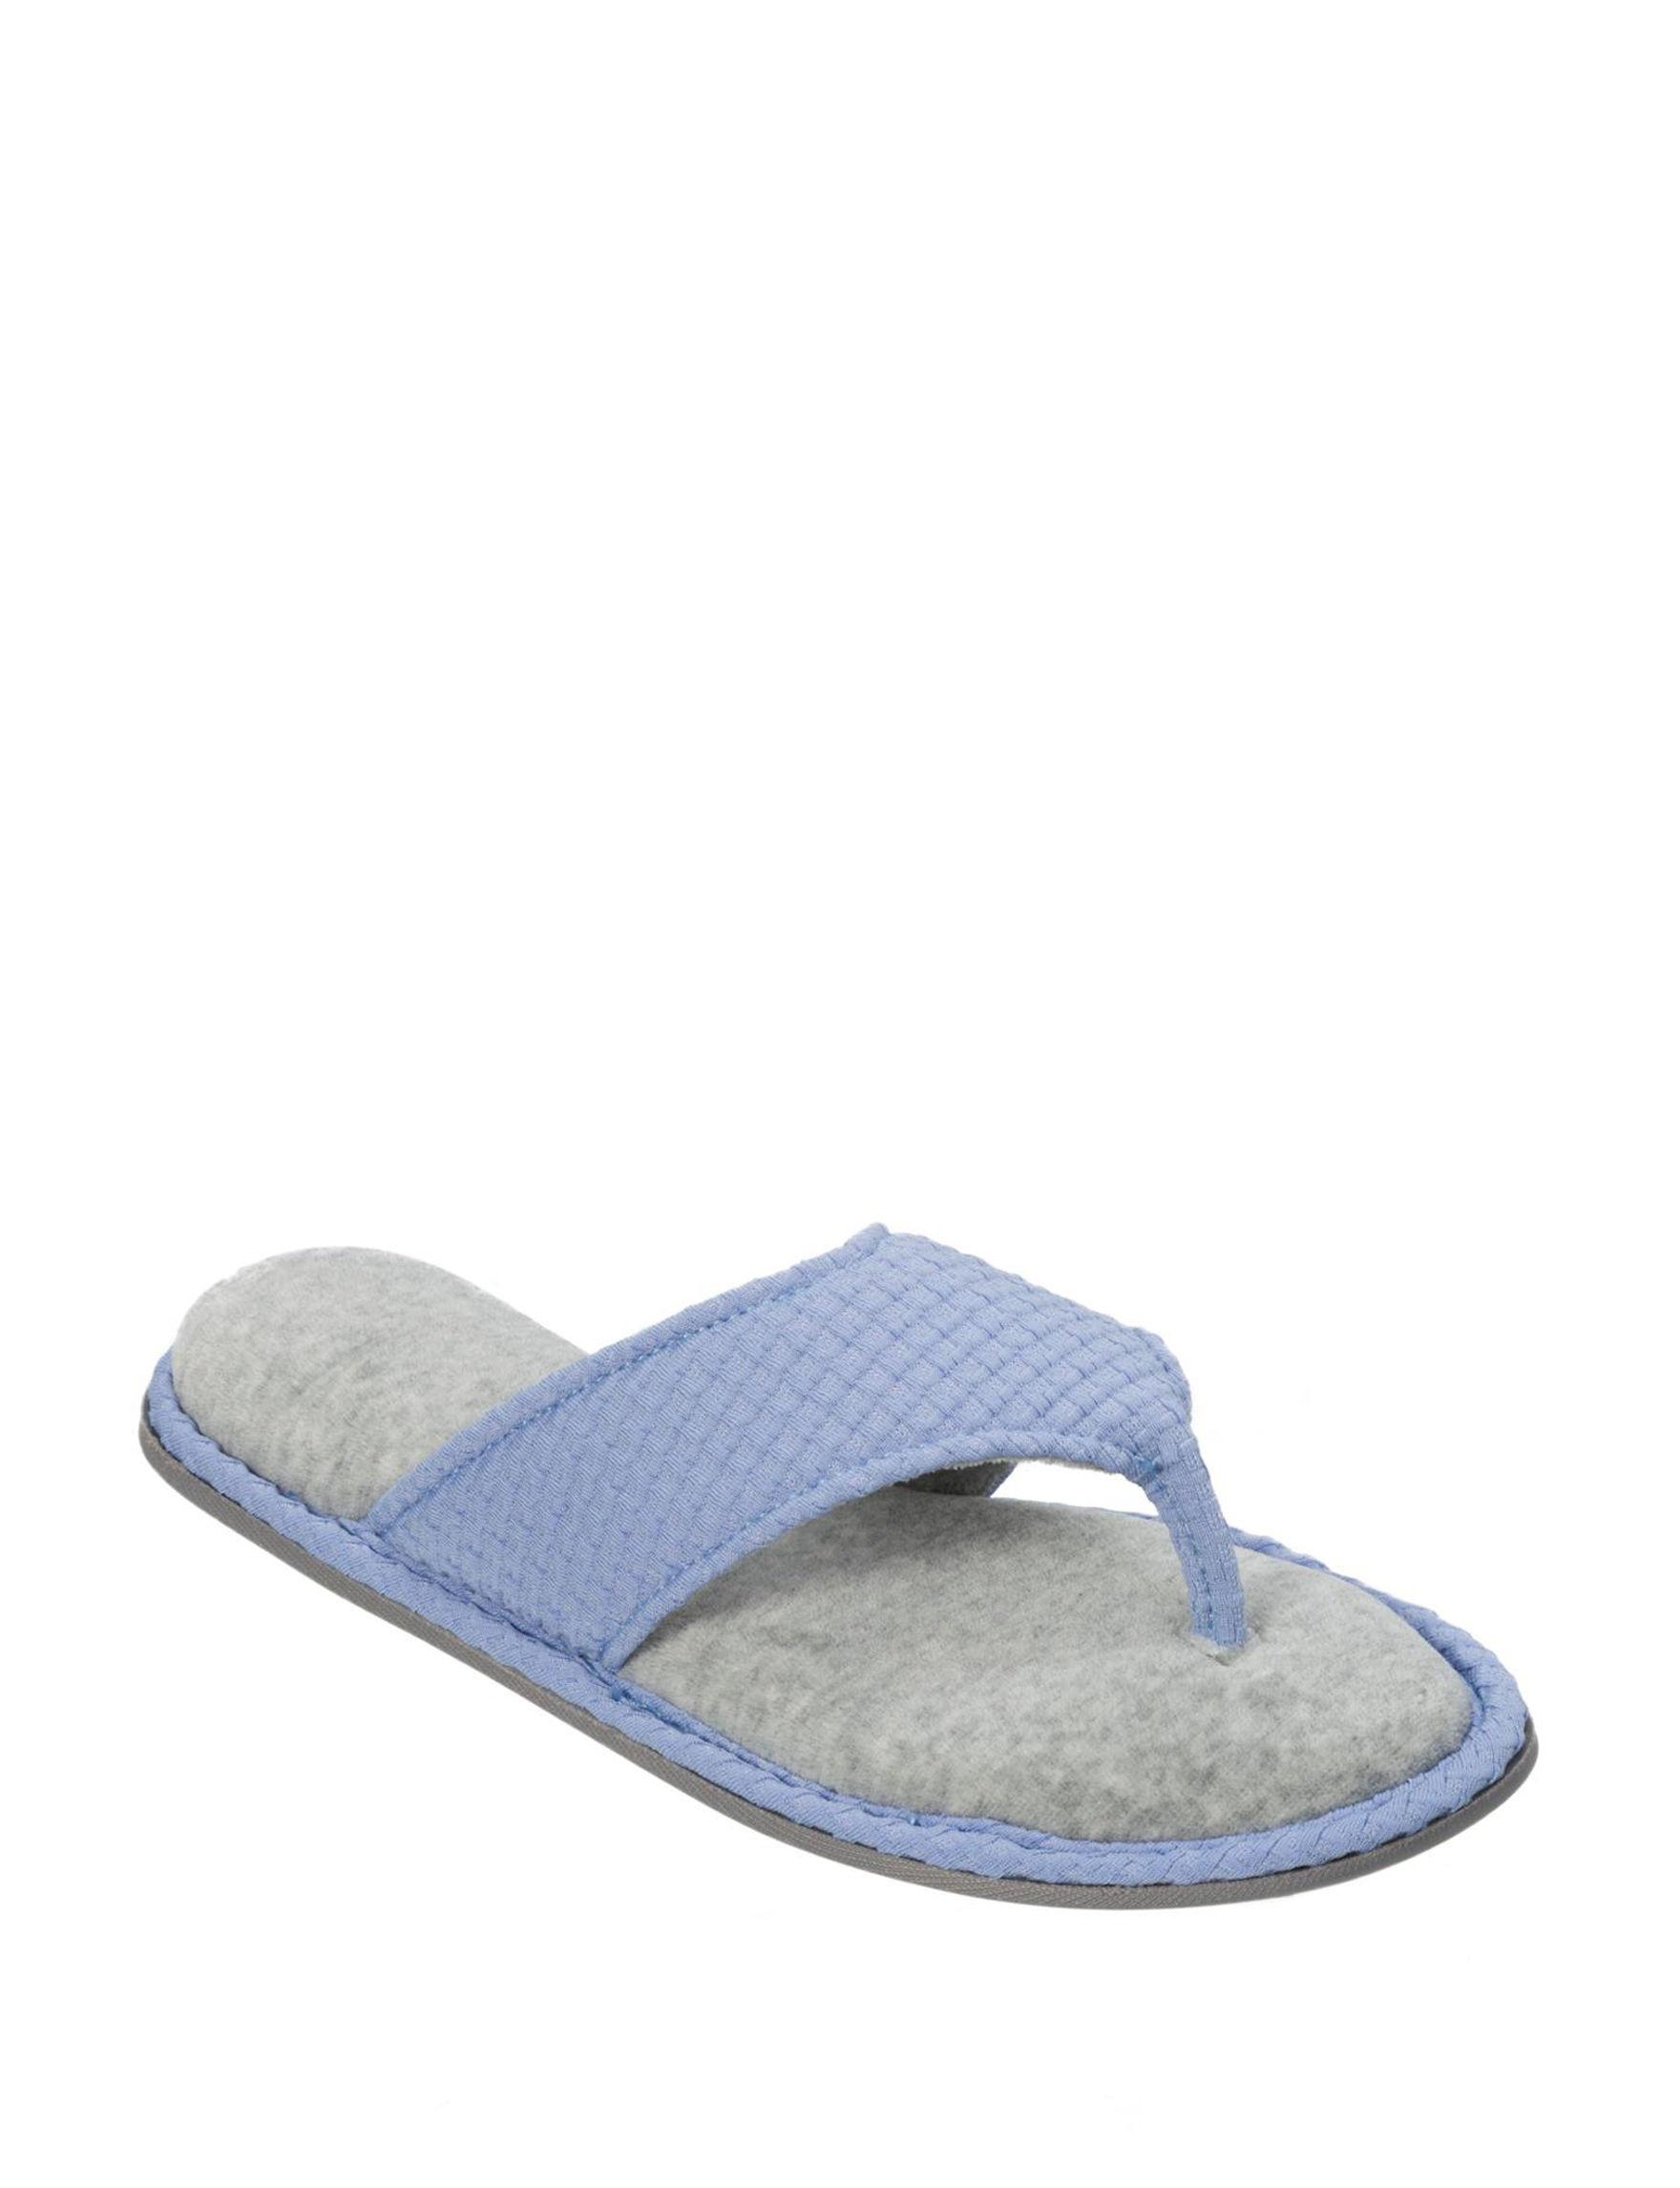 Dearfoams Blue Slipper Sandals